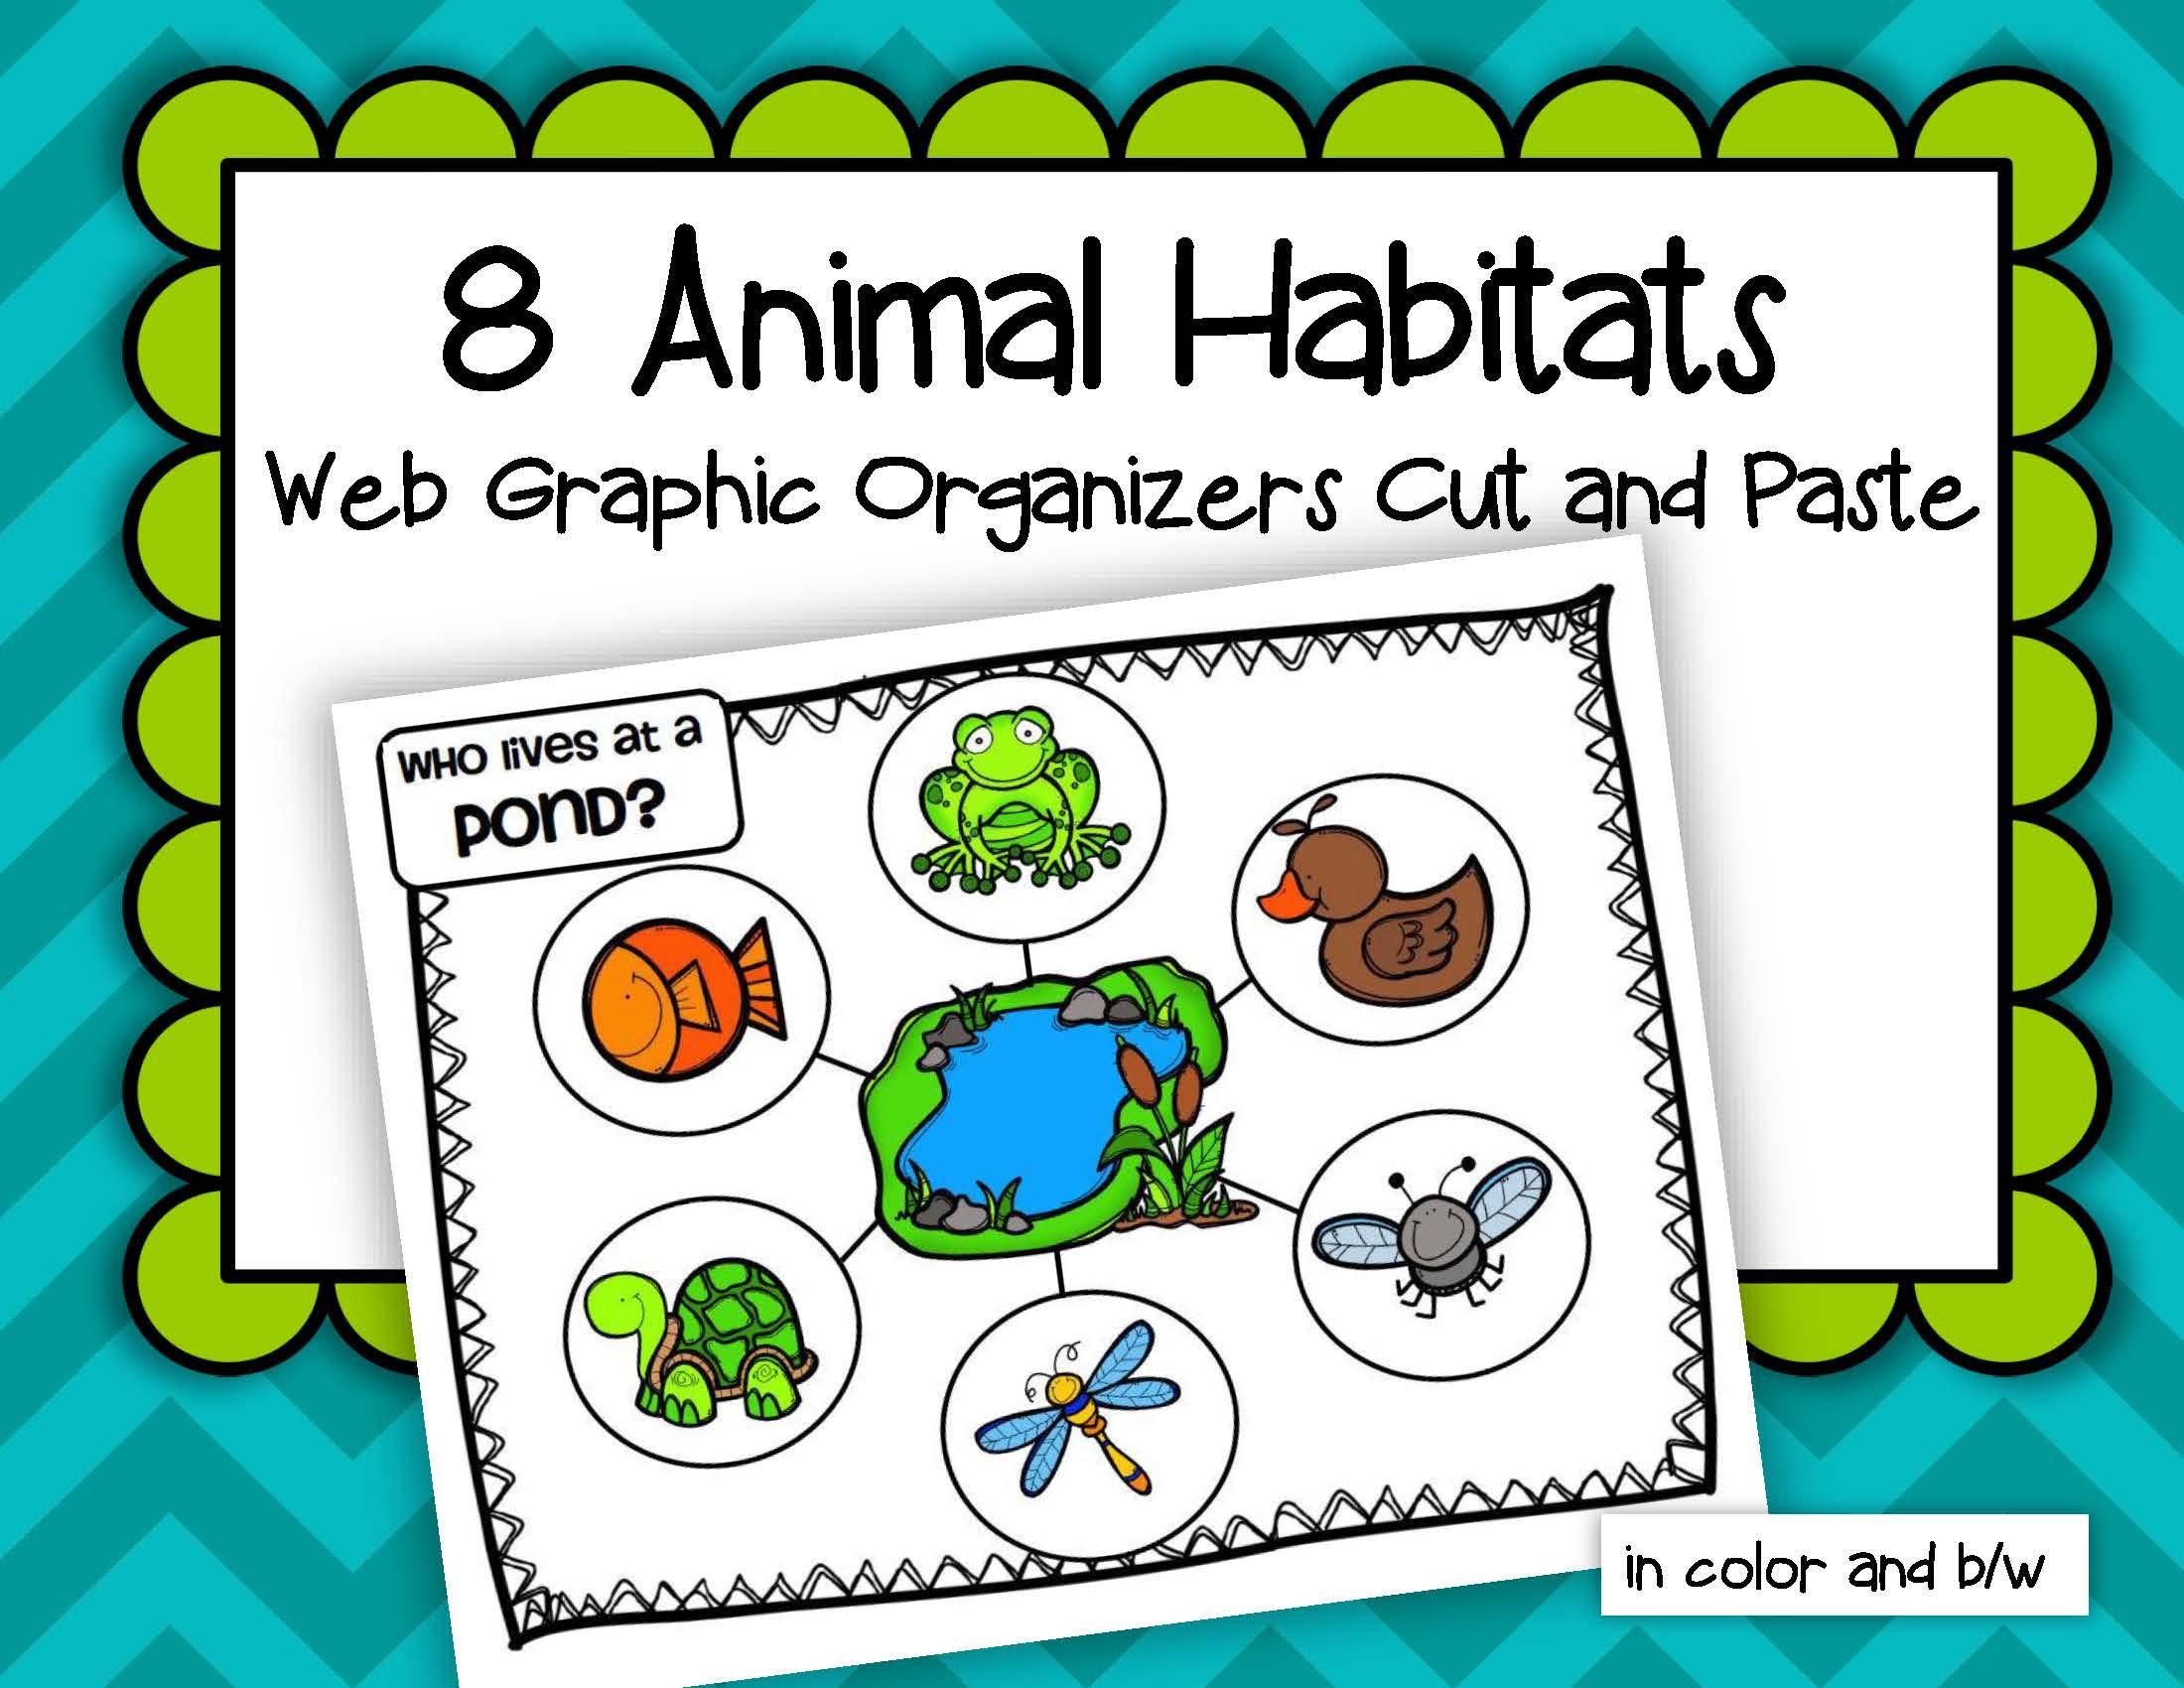 Animals Habitats Web Graphic Organizers Cut And Paste